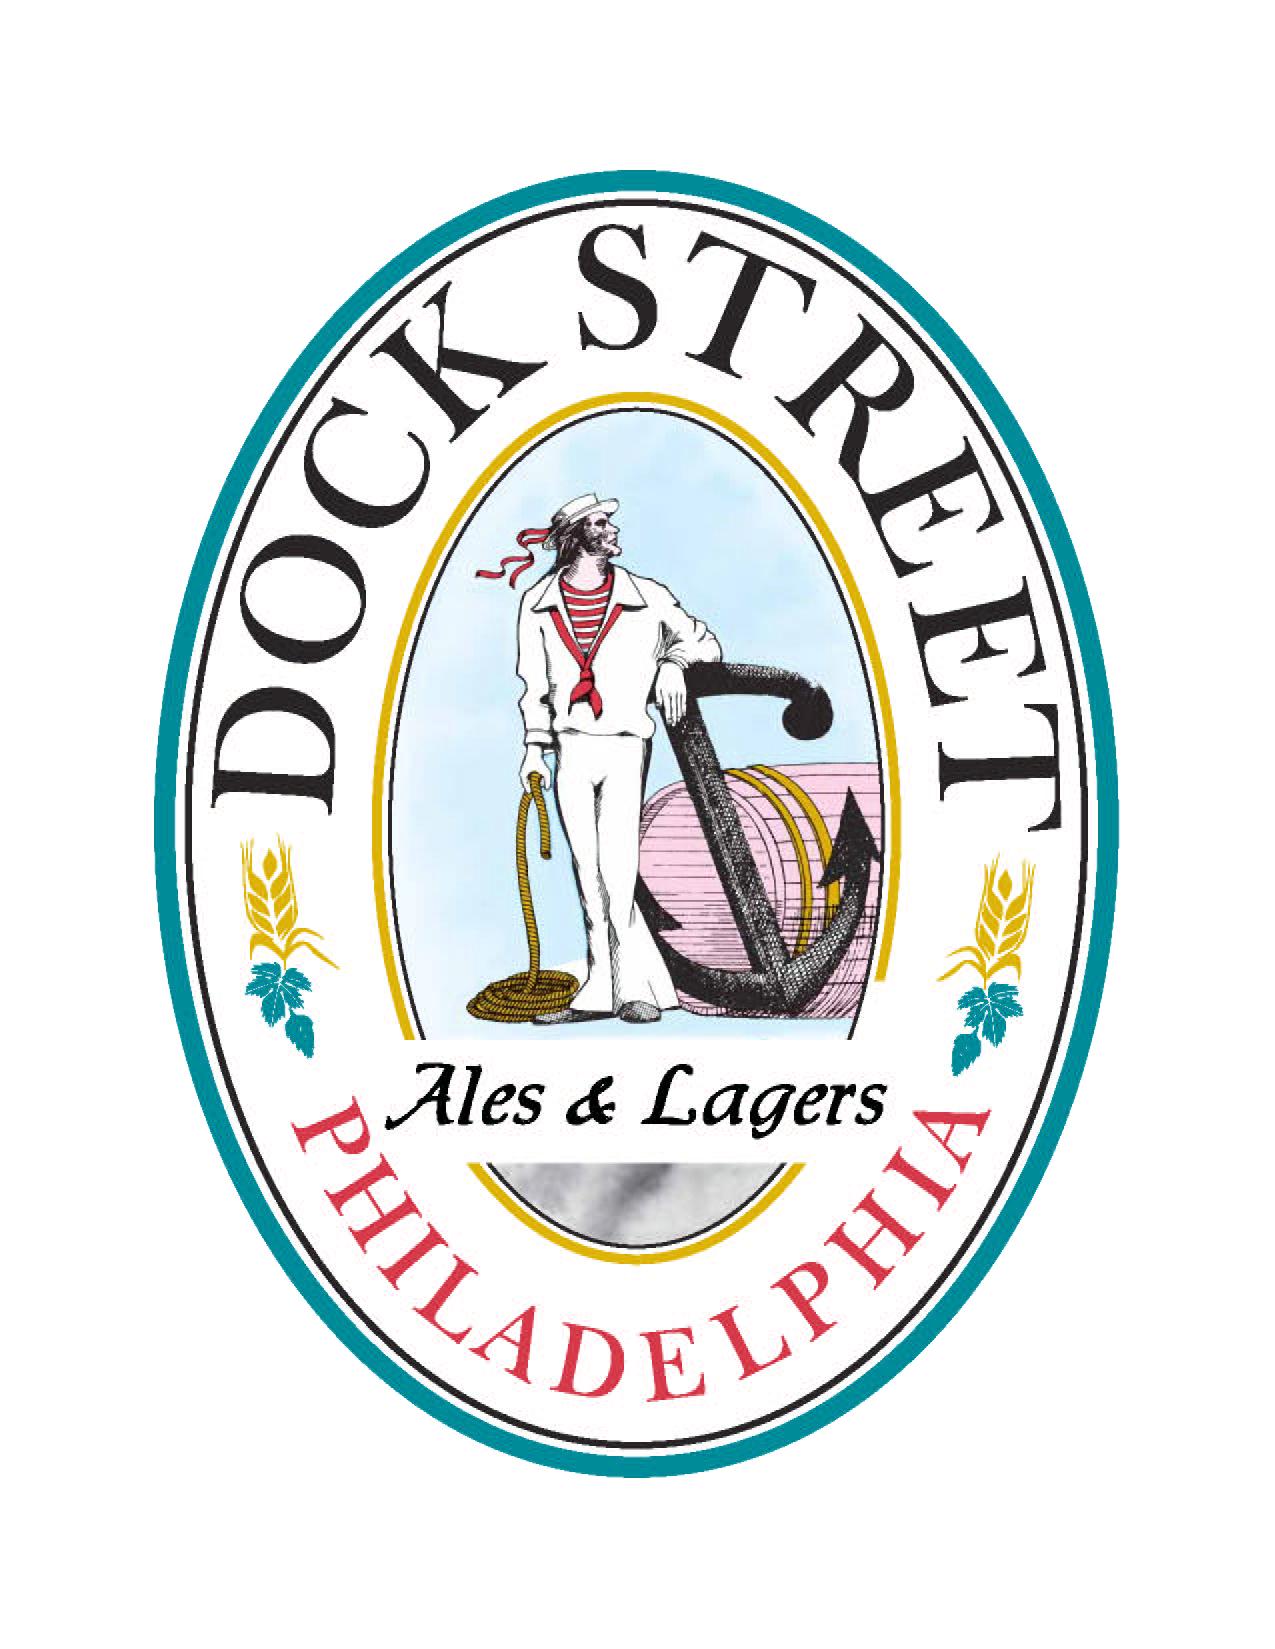 Dock Street Brewing